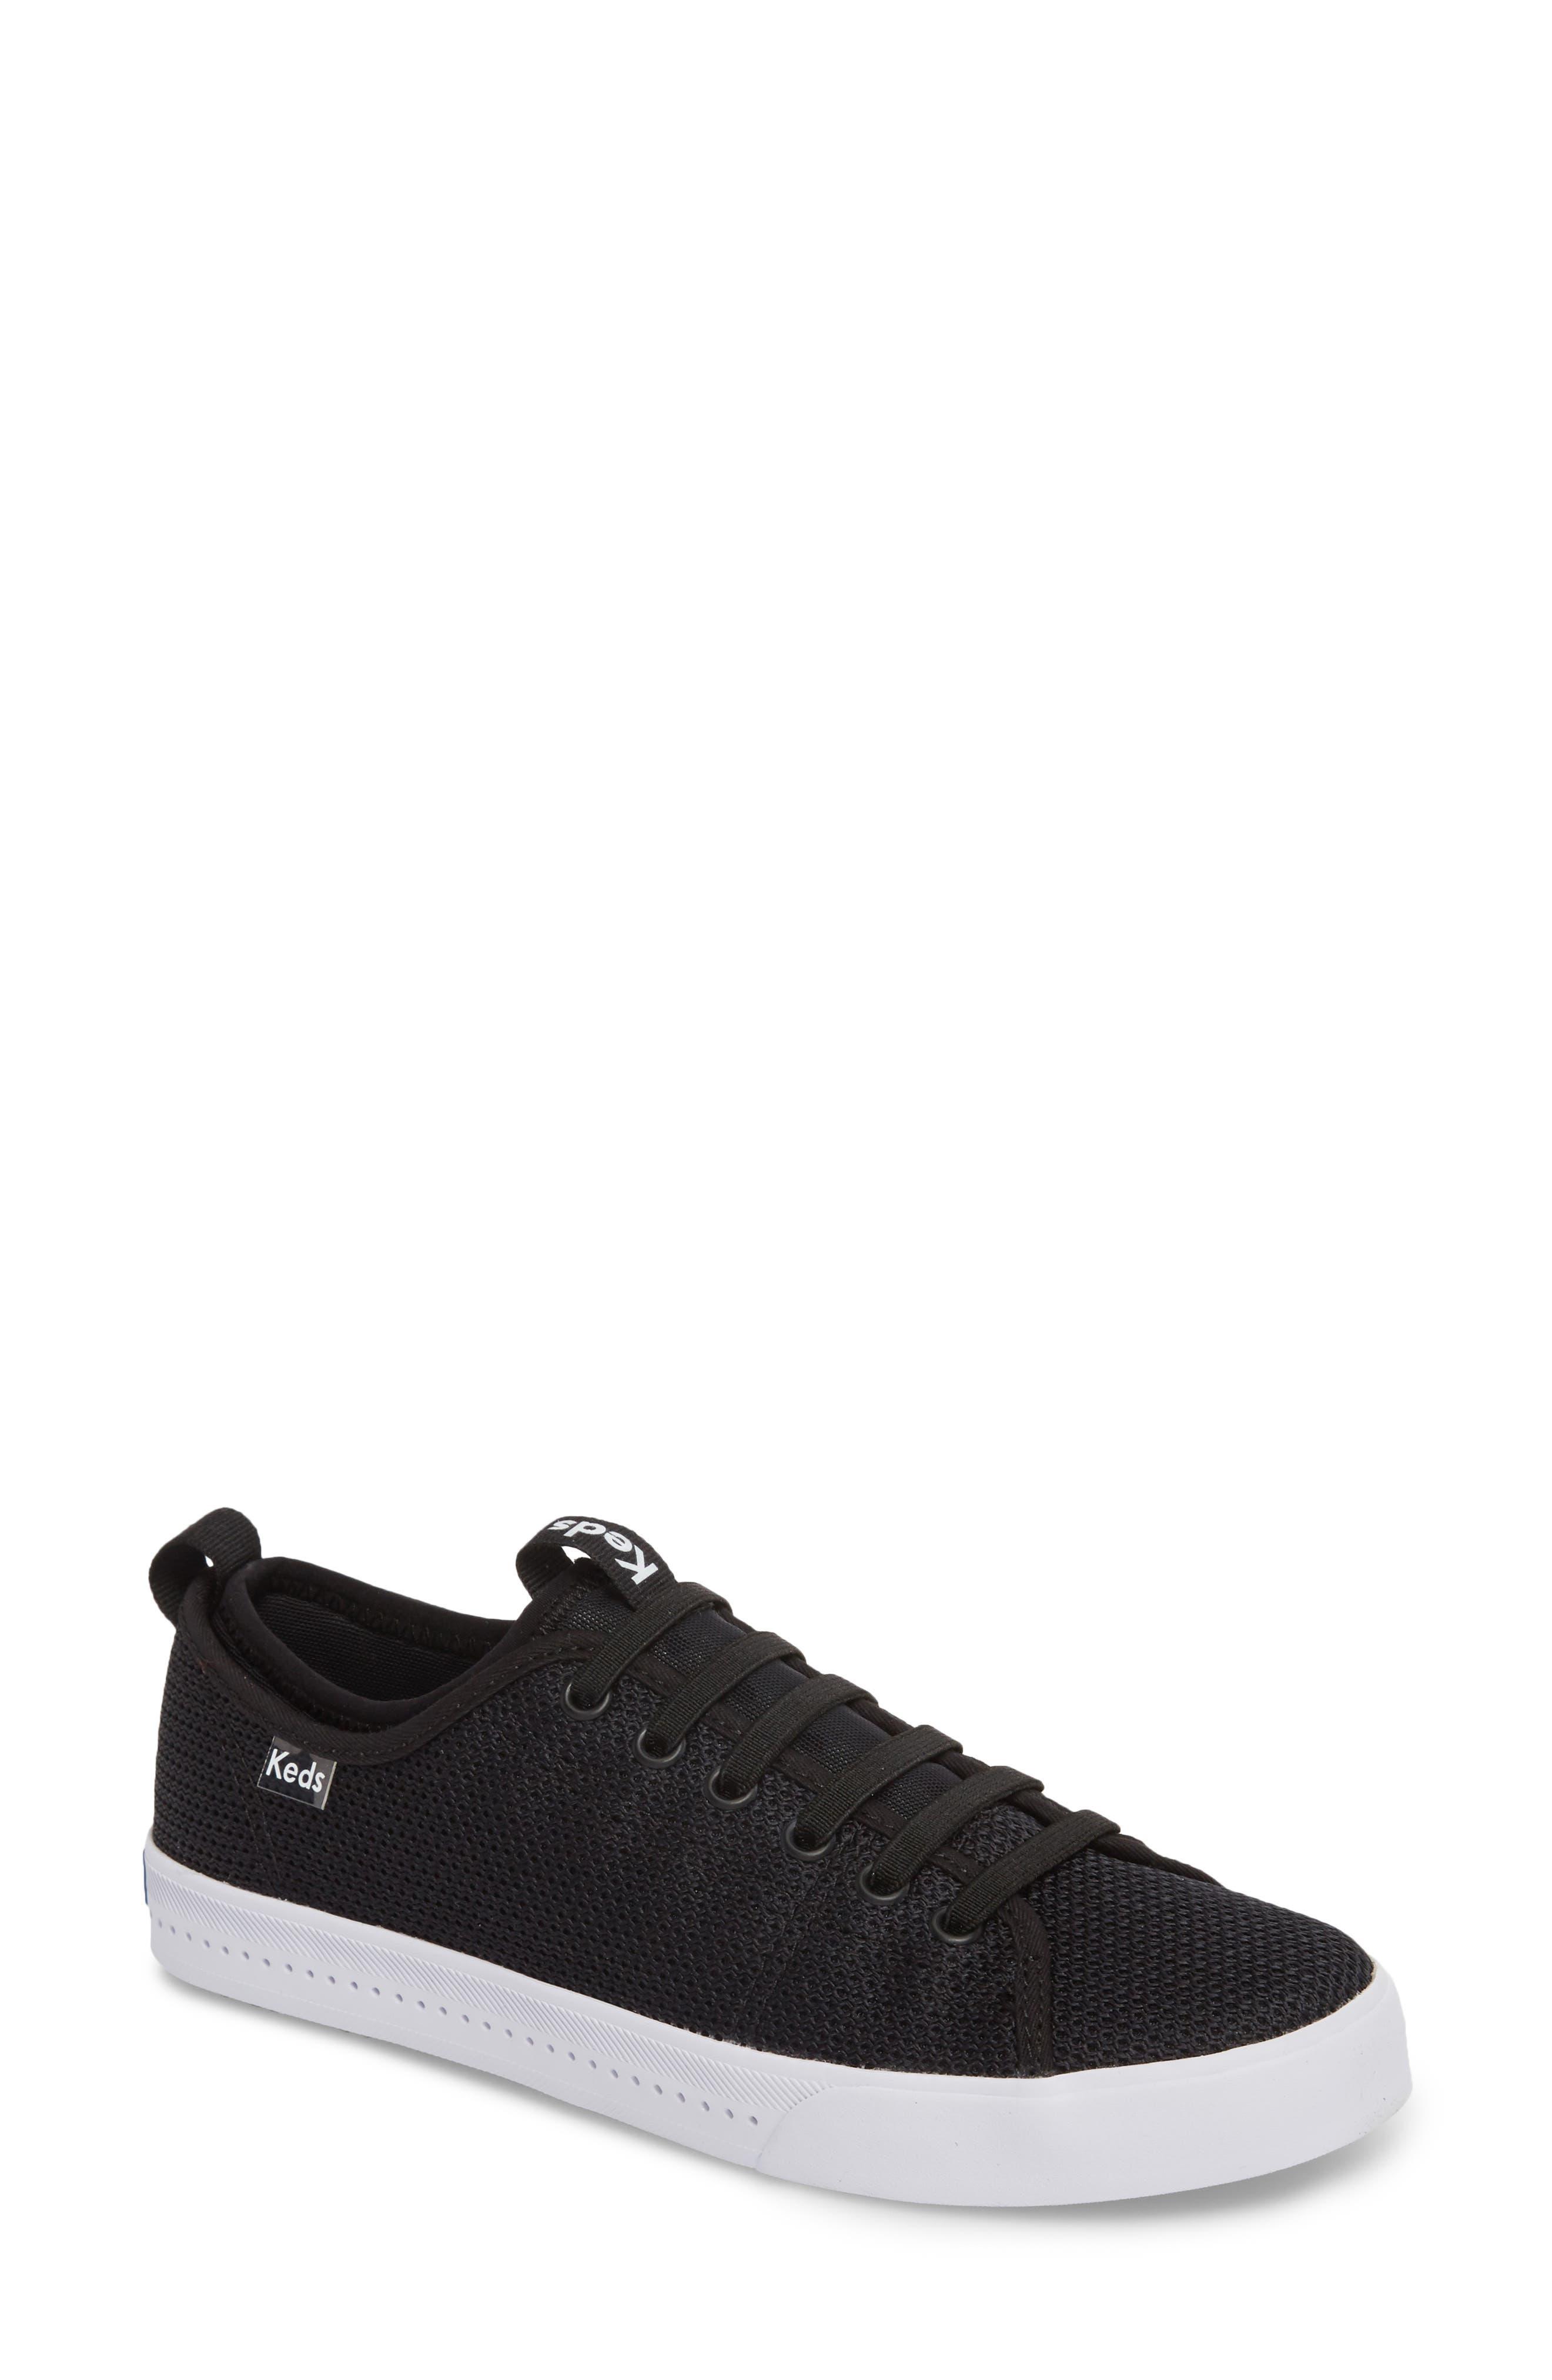 Driftkick Heathered Mesh Sneaker,                         Main,                         color, Black